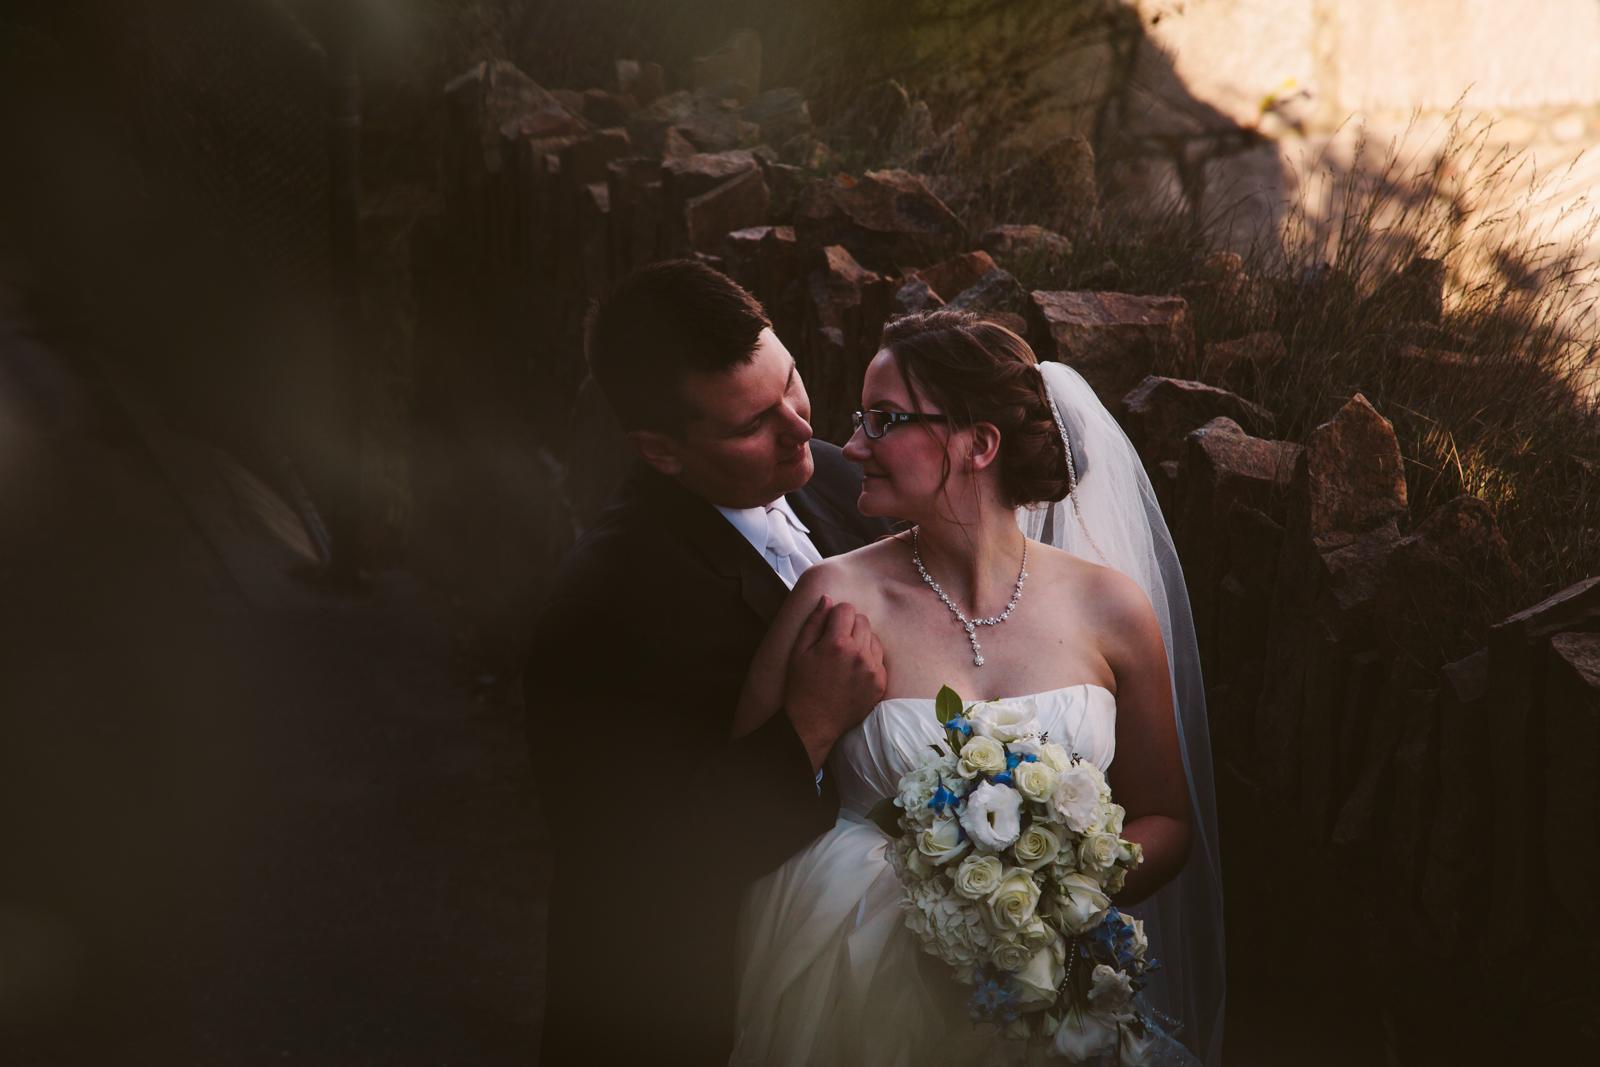 Eastons-Beach-Rotunda-Ballroom-Wedding-Newport-Rhode-Island-PhotographybyAmandaMorgan-53.jpg